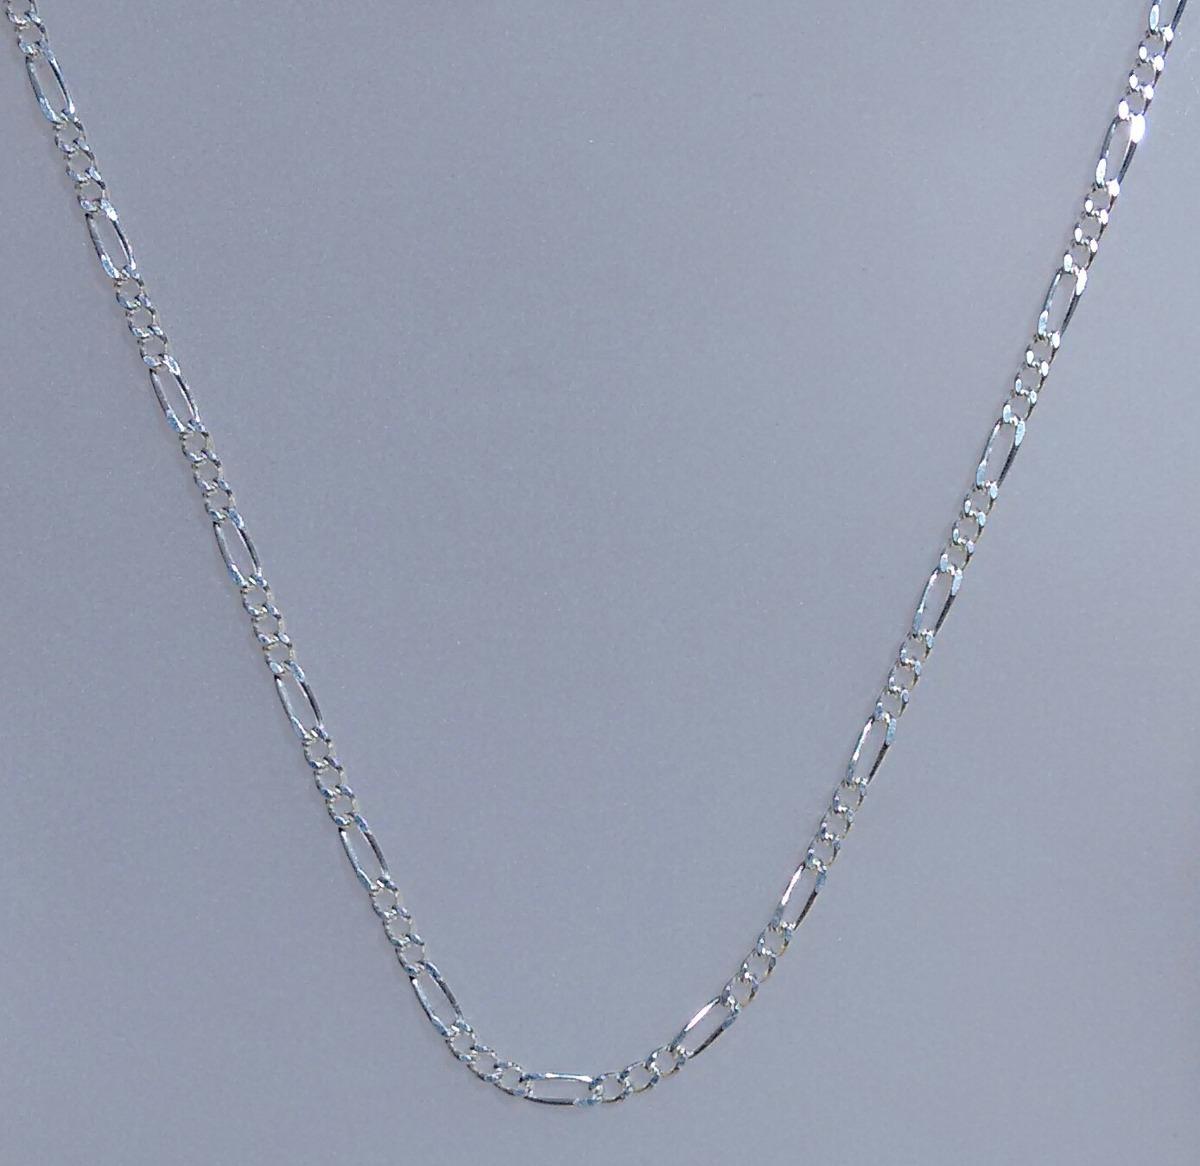 e9dff10cb970 cadena de plata 925 italiana largo 50 cm-regalo cumple. Cargando zoom.